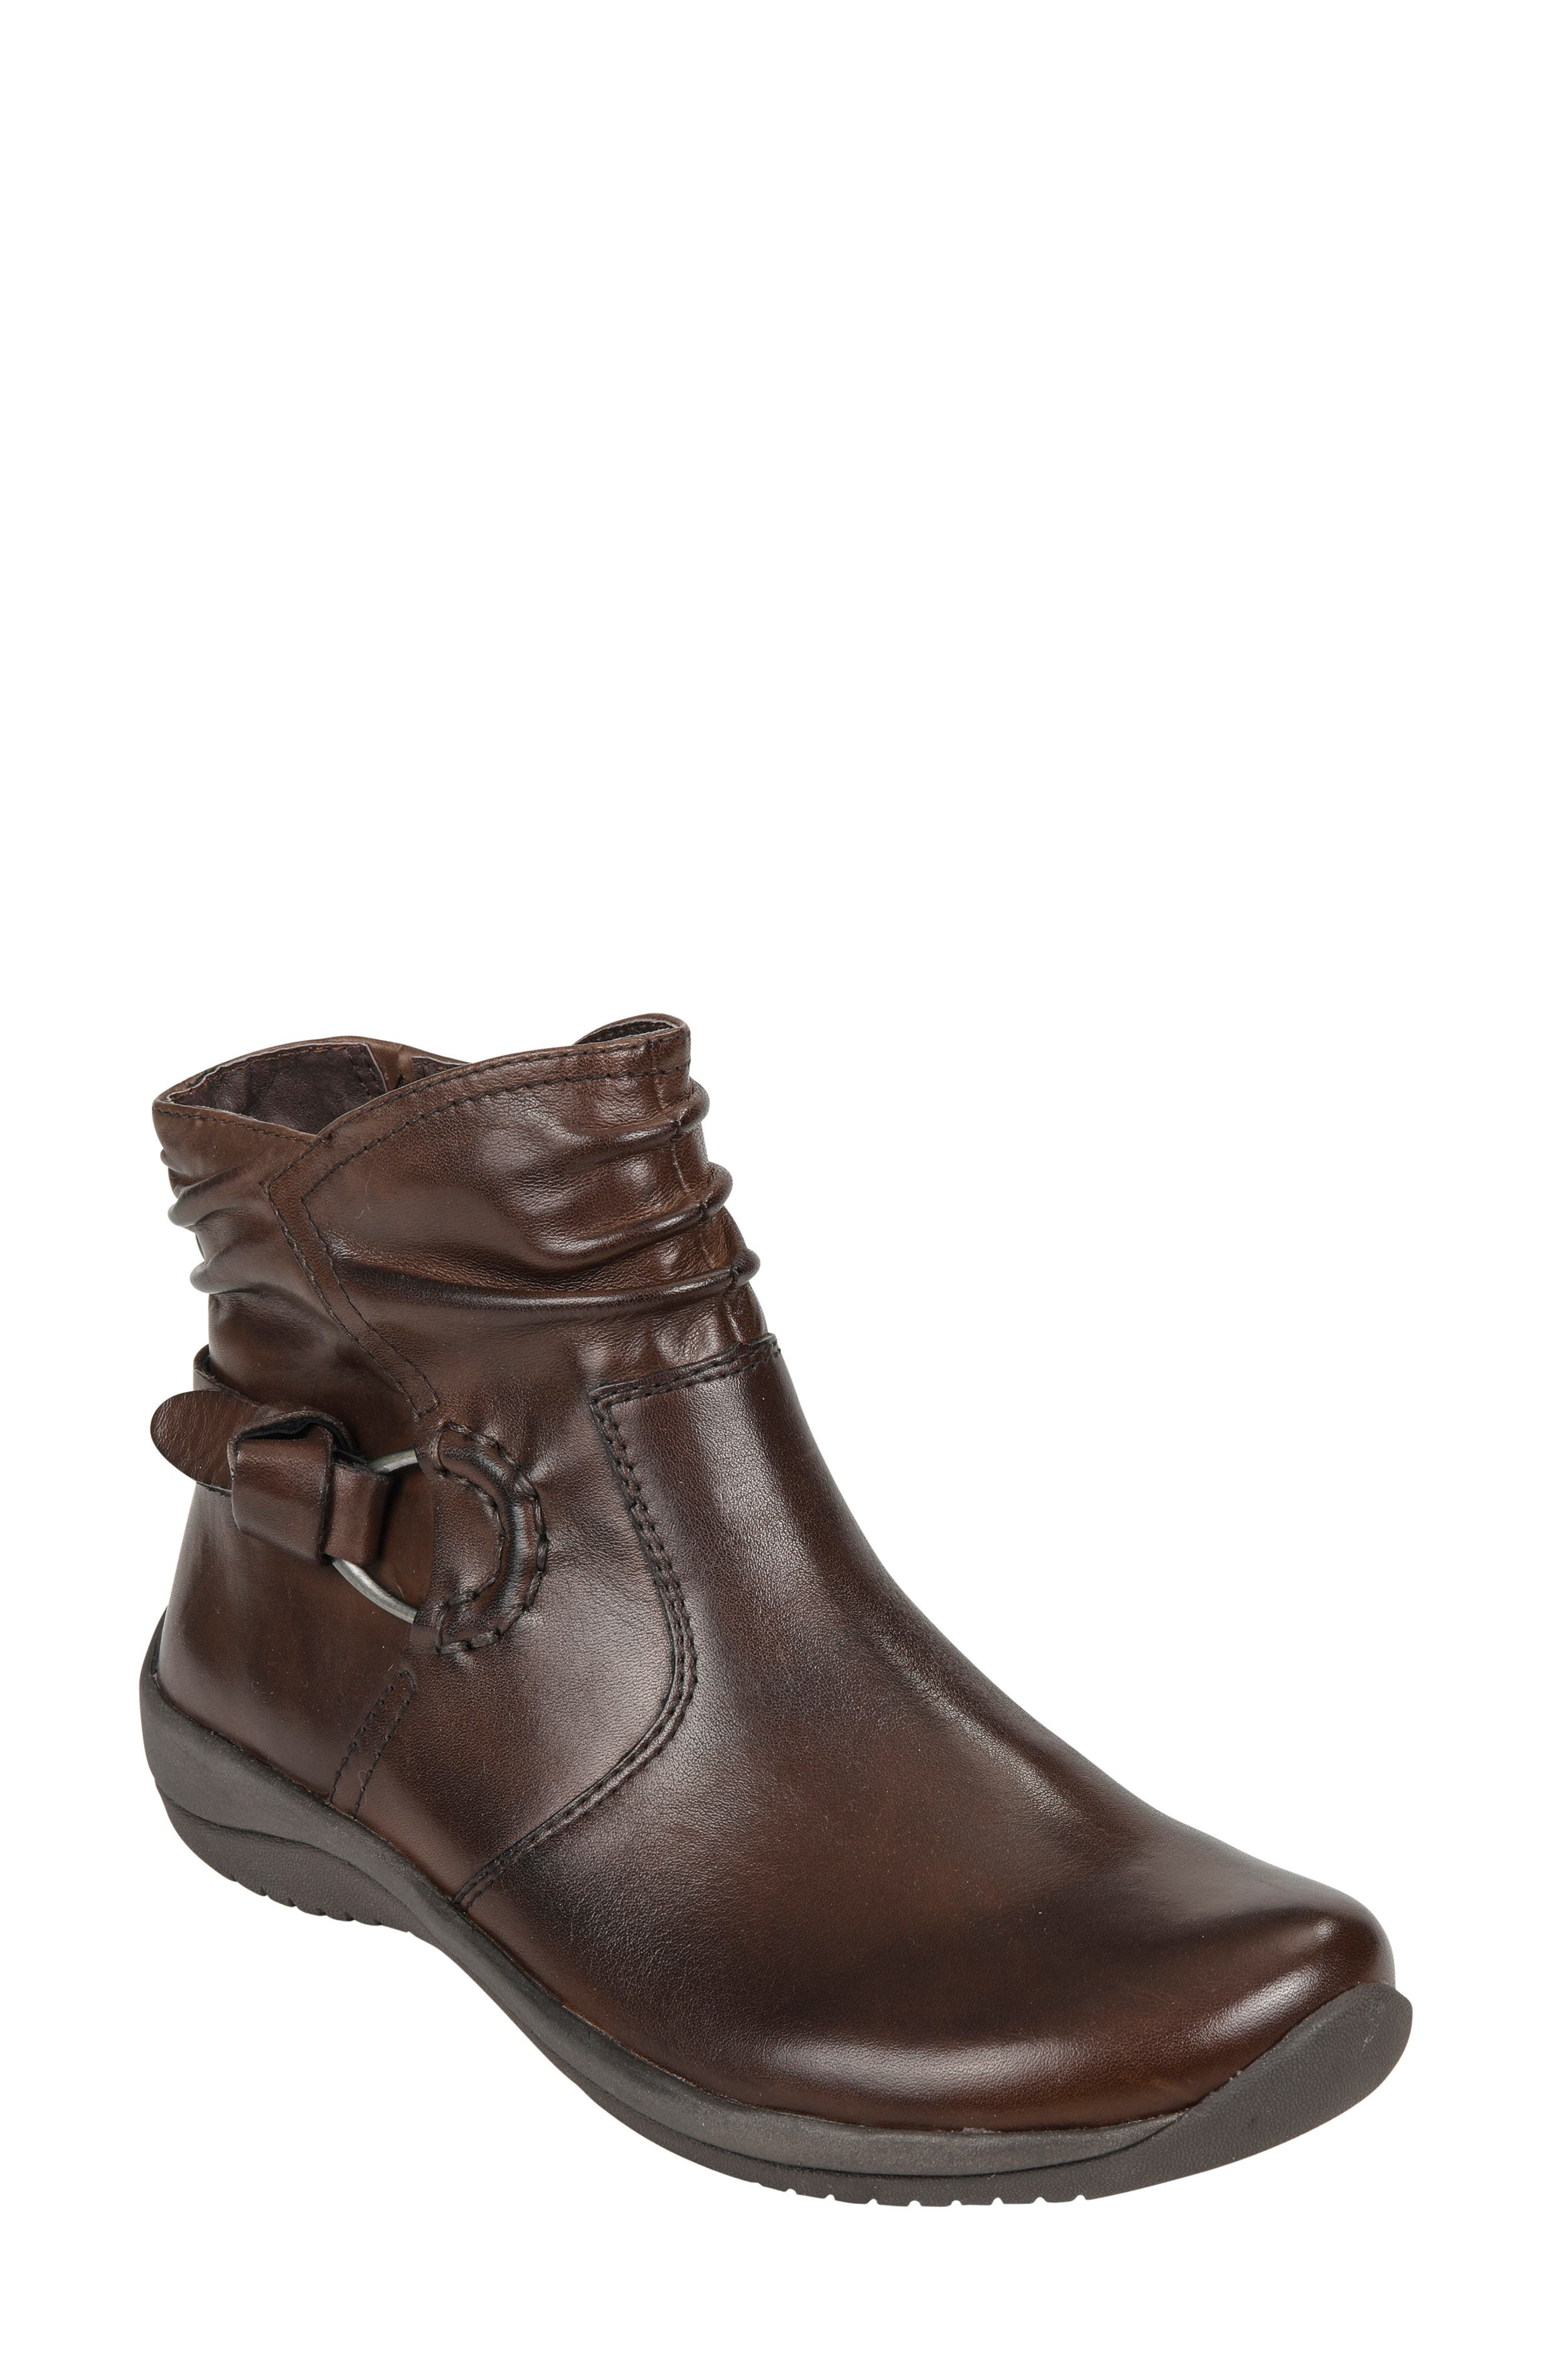 cb2e2544f3 Earth® Shoes